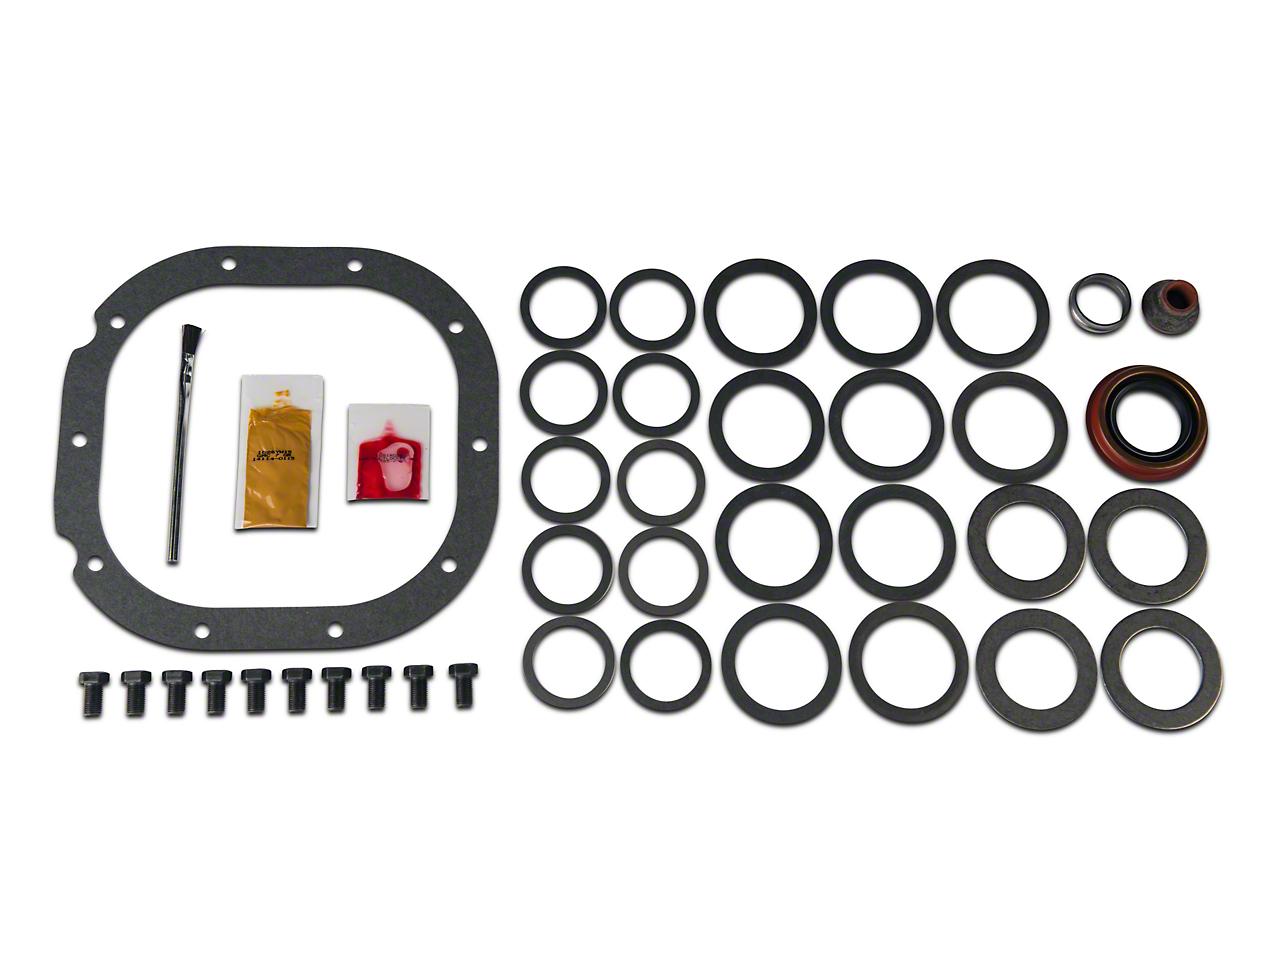 Motive Rear End Installation Kit - 8.8 in. (86-14 V8; 11-14 V6)